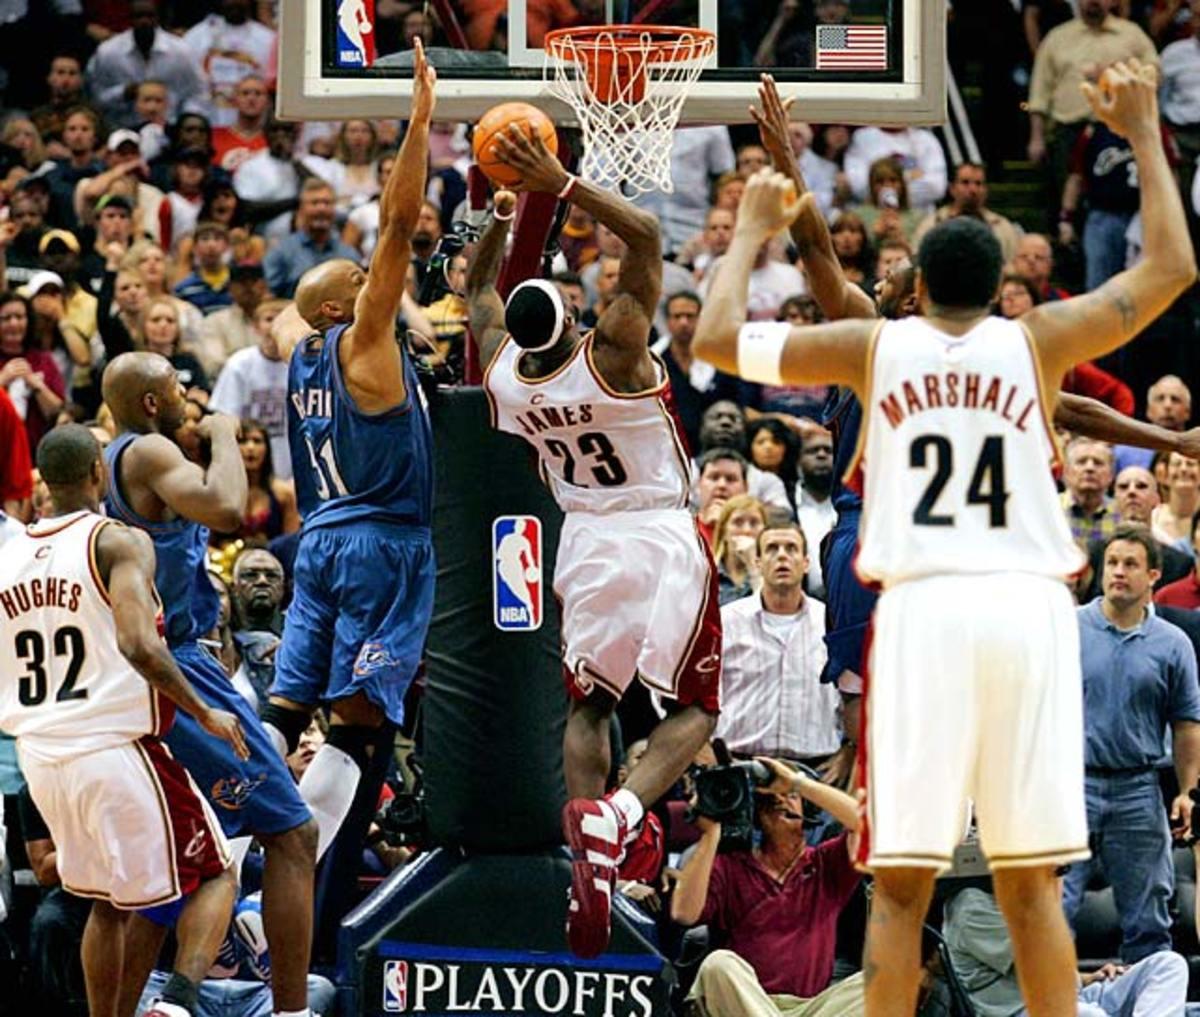 May 3, 2006, vs. Washington